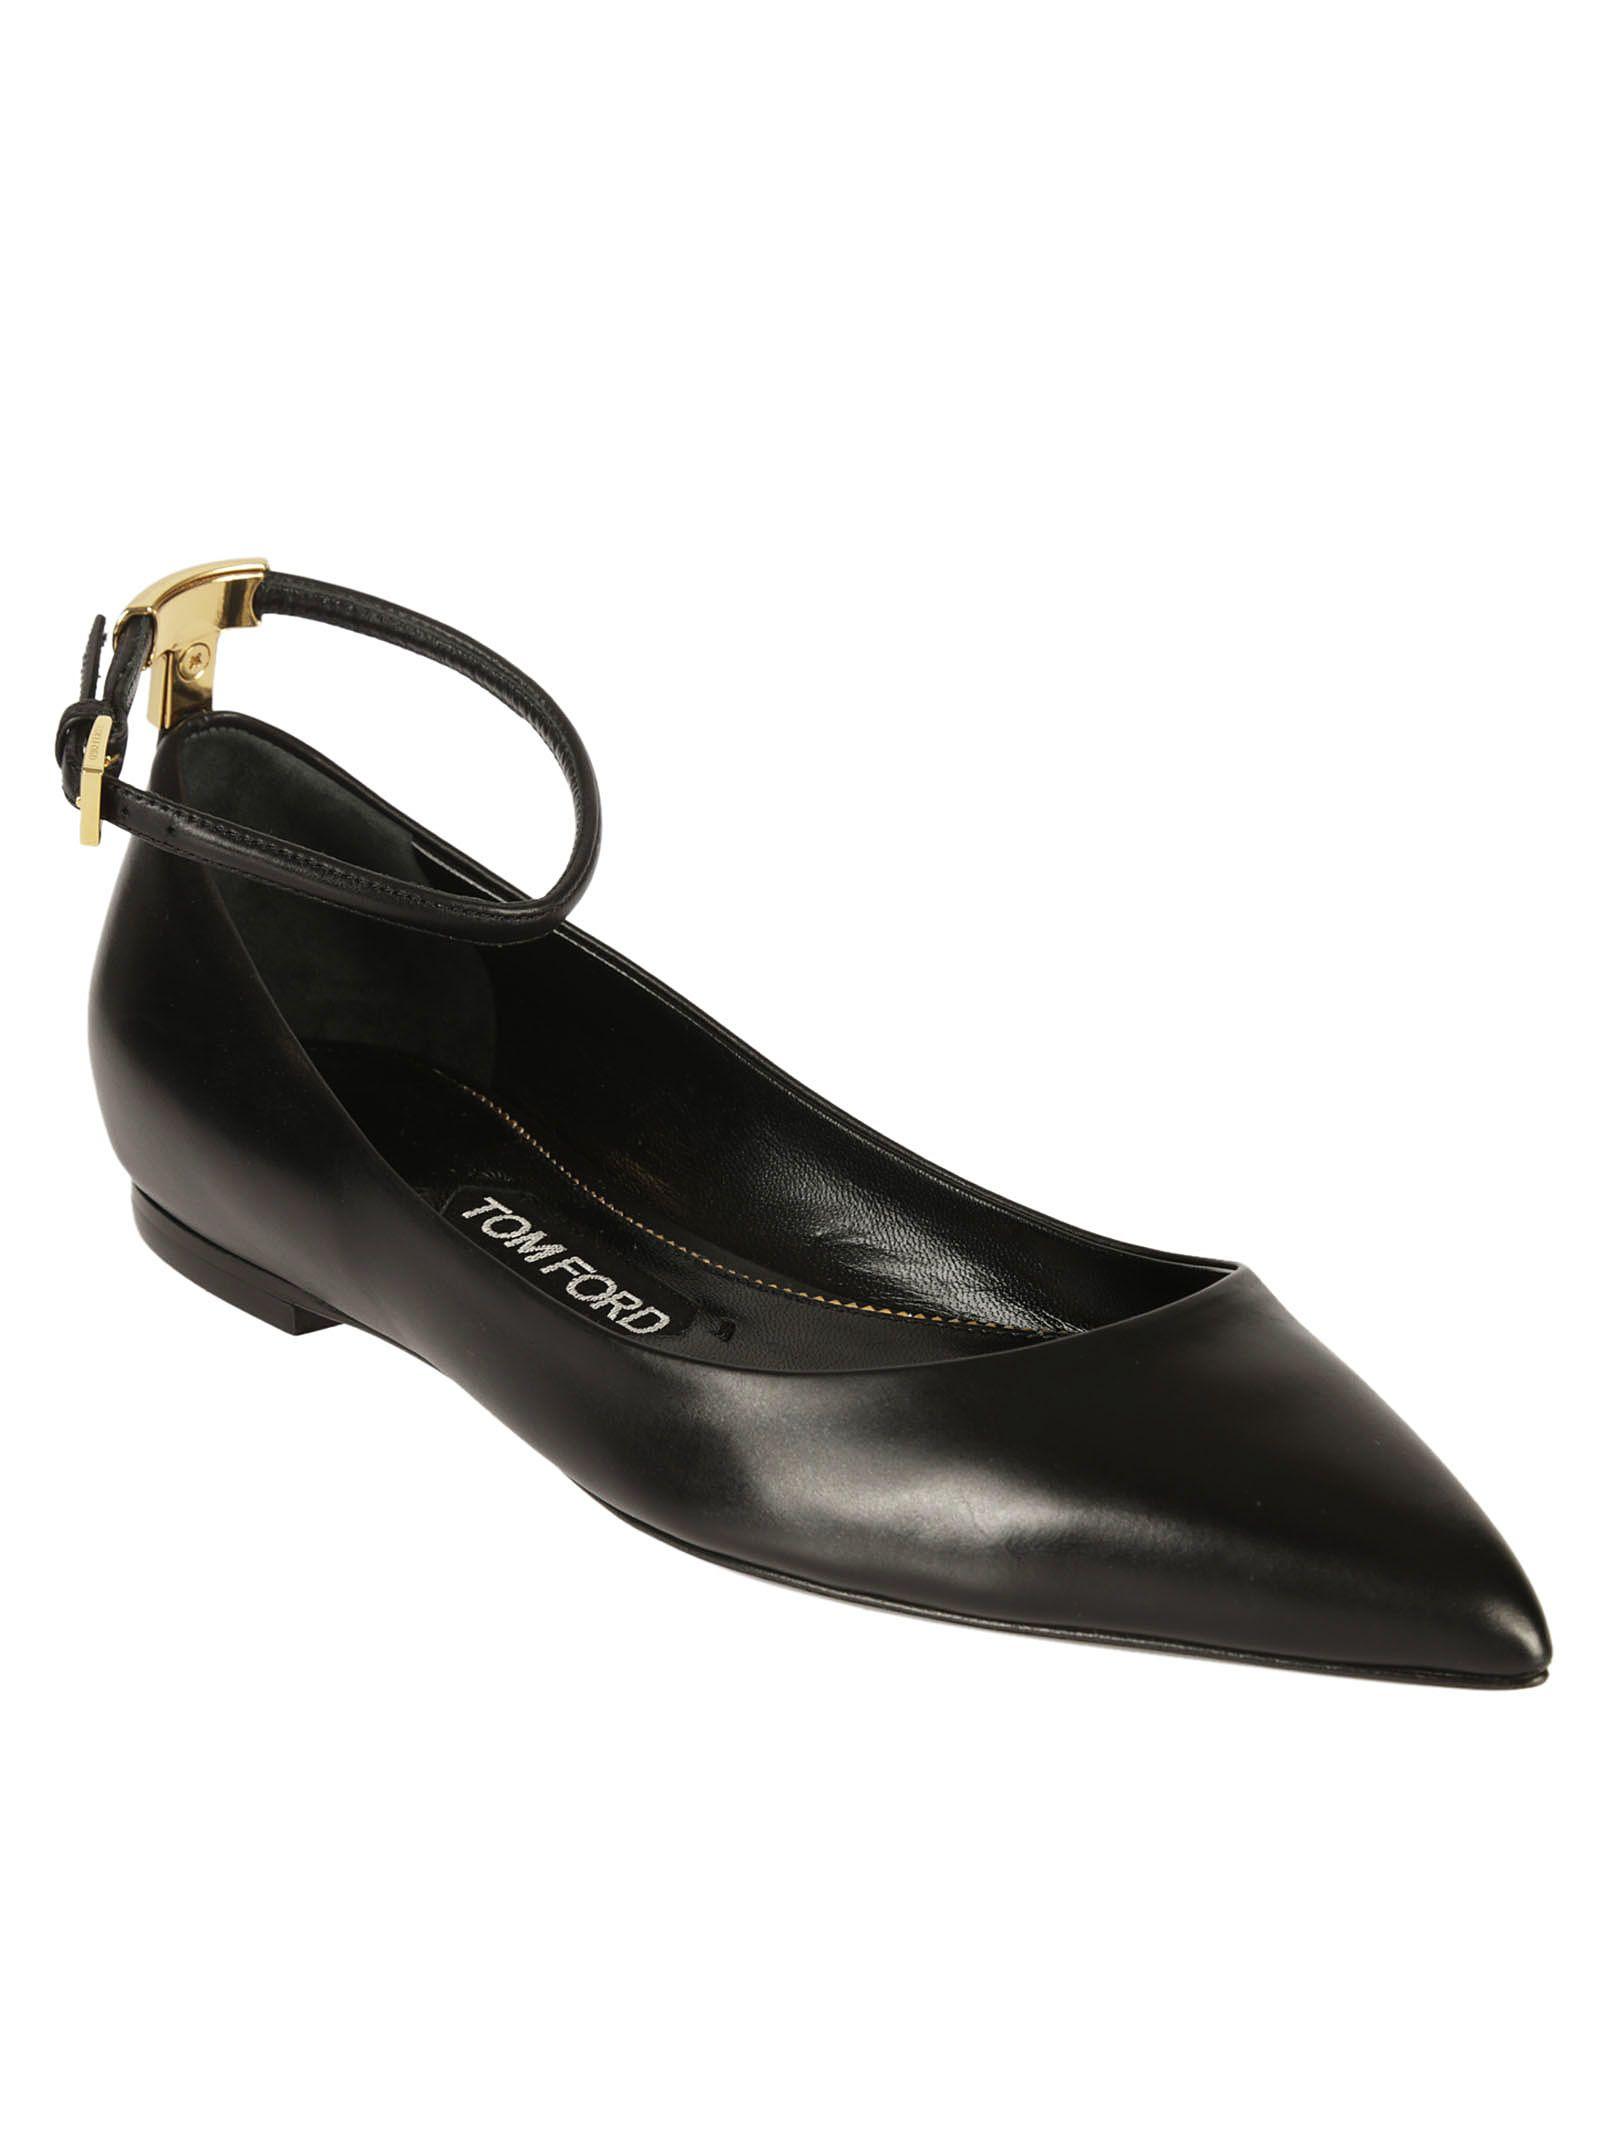 Tom Ford Ankle Strap Ballerinas